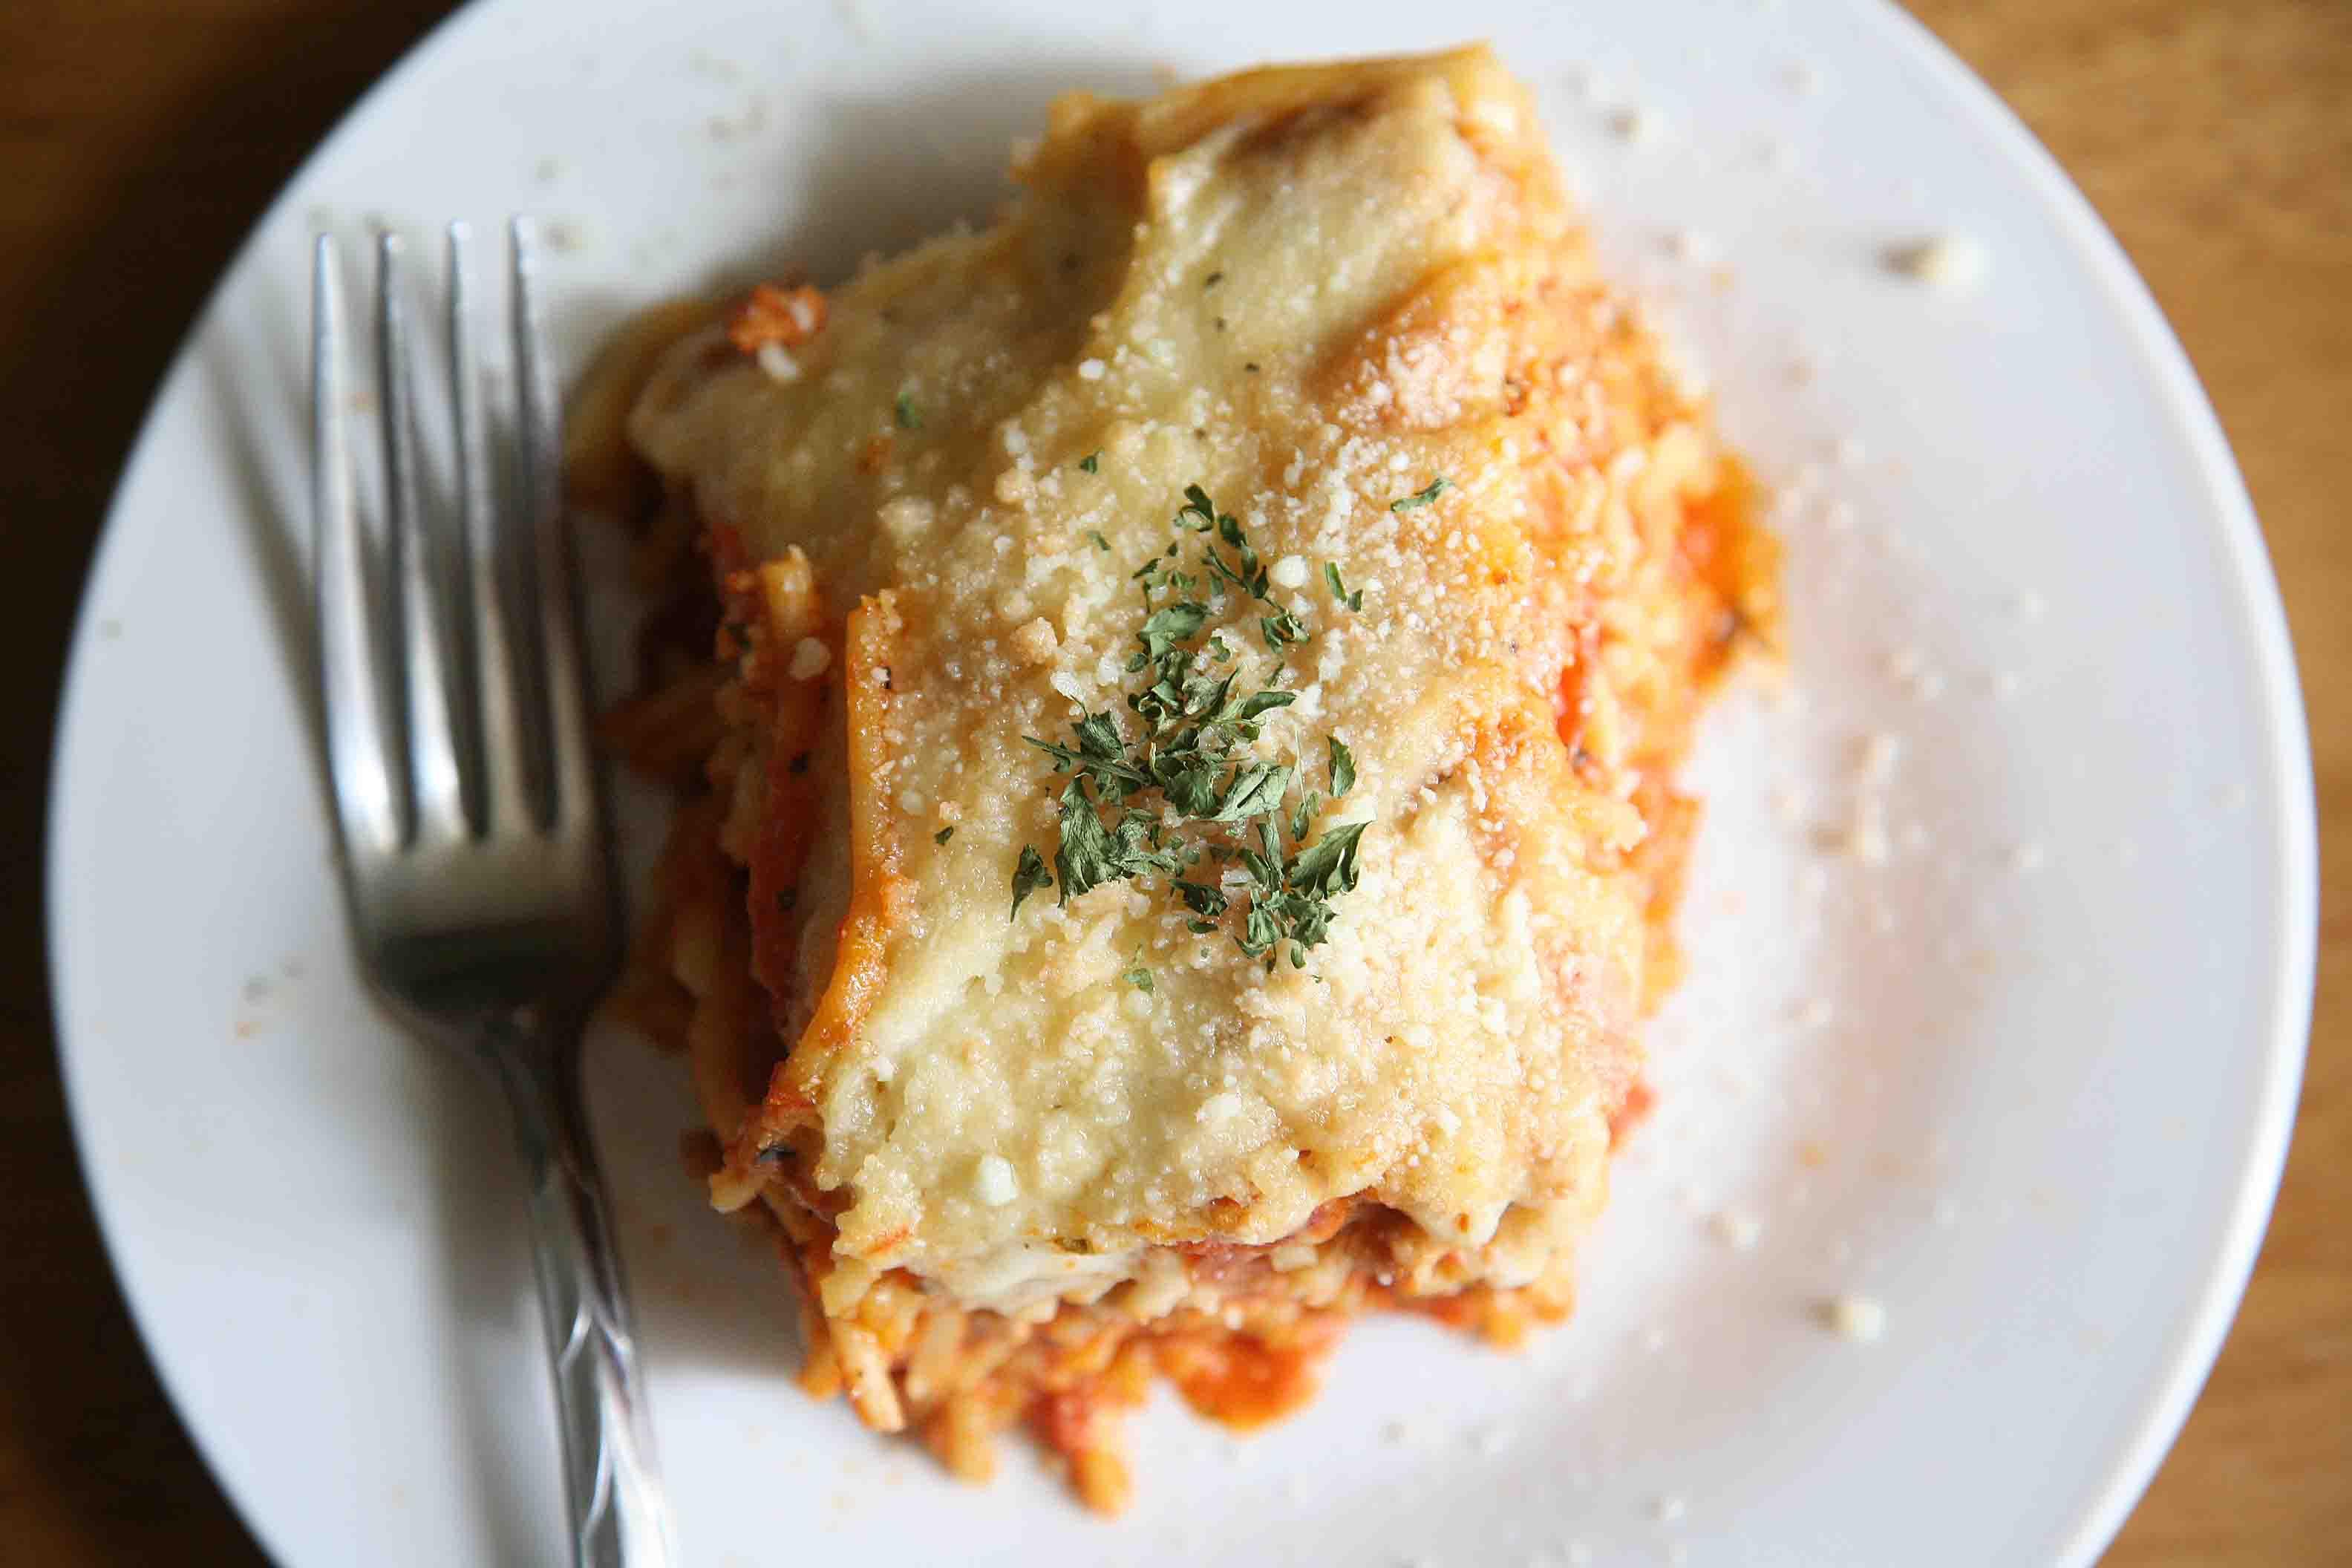 Creamy Baked Spaghetti (Kitchionista Style)